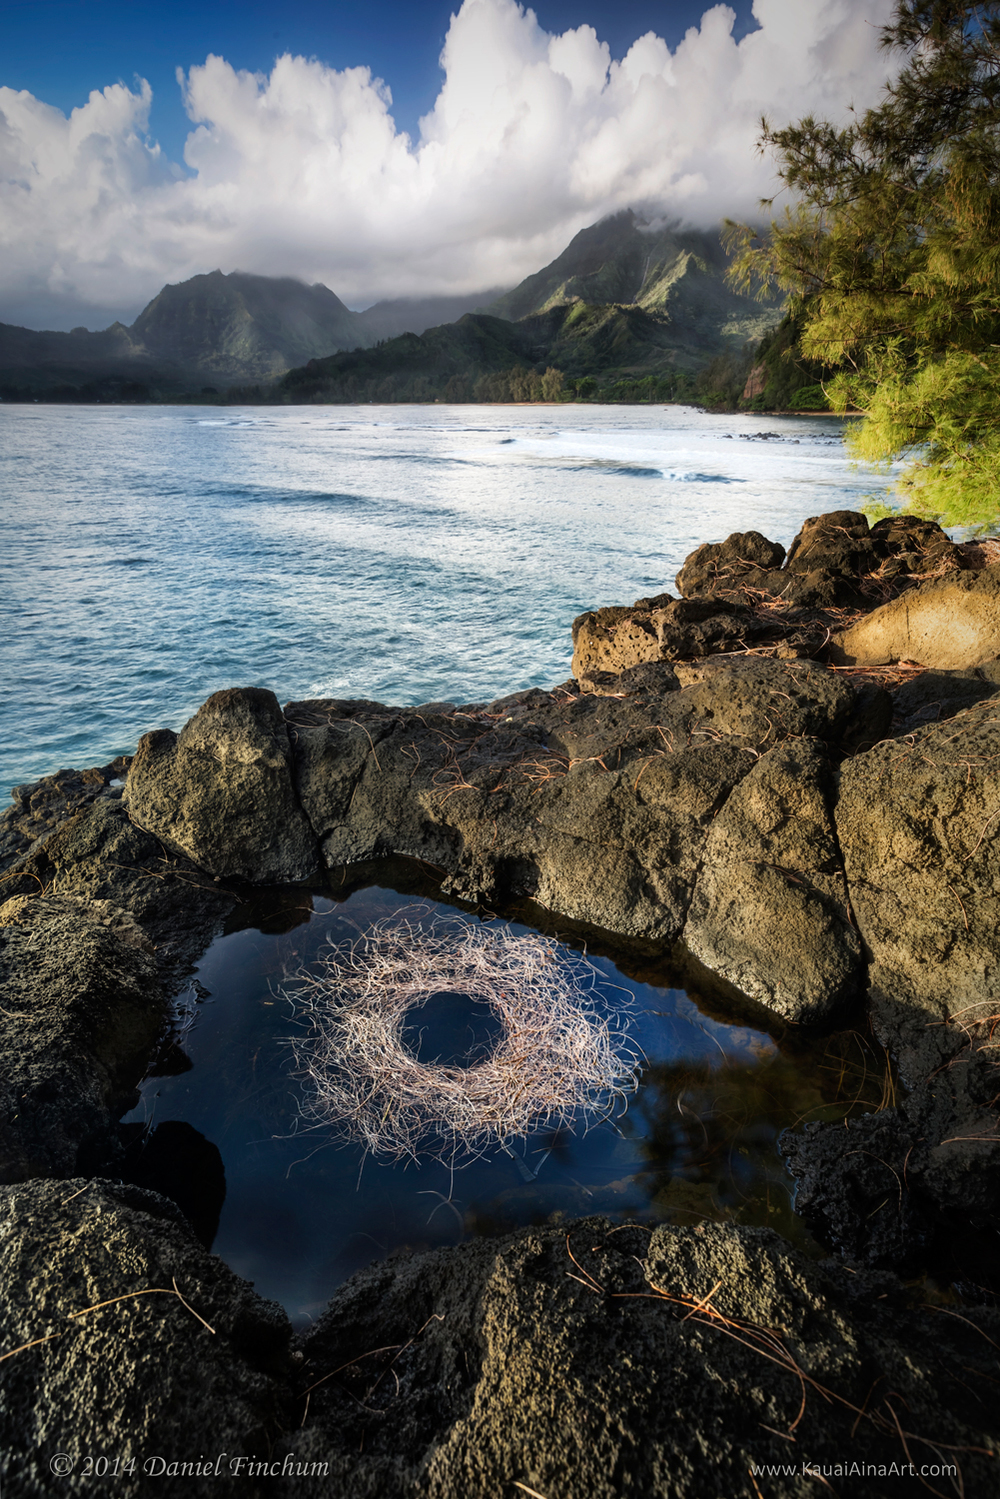 Ke Aloha O Hanalei (Hanalei Embrace)